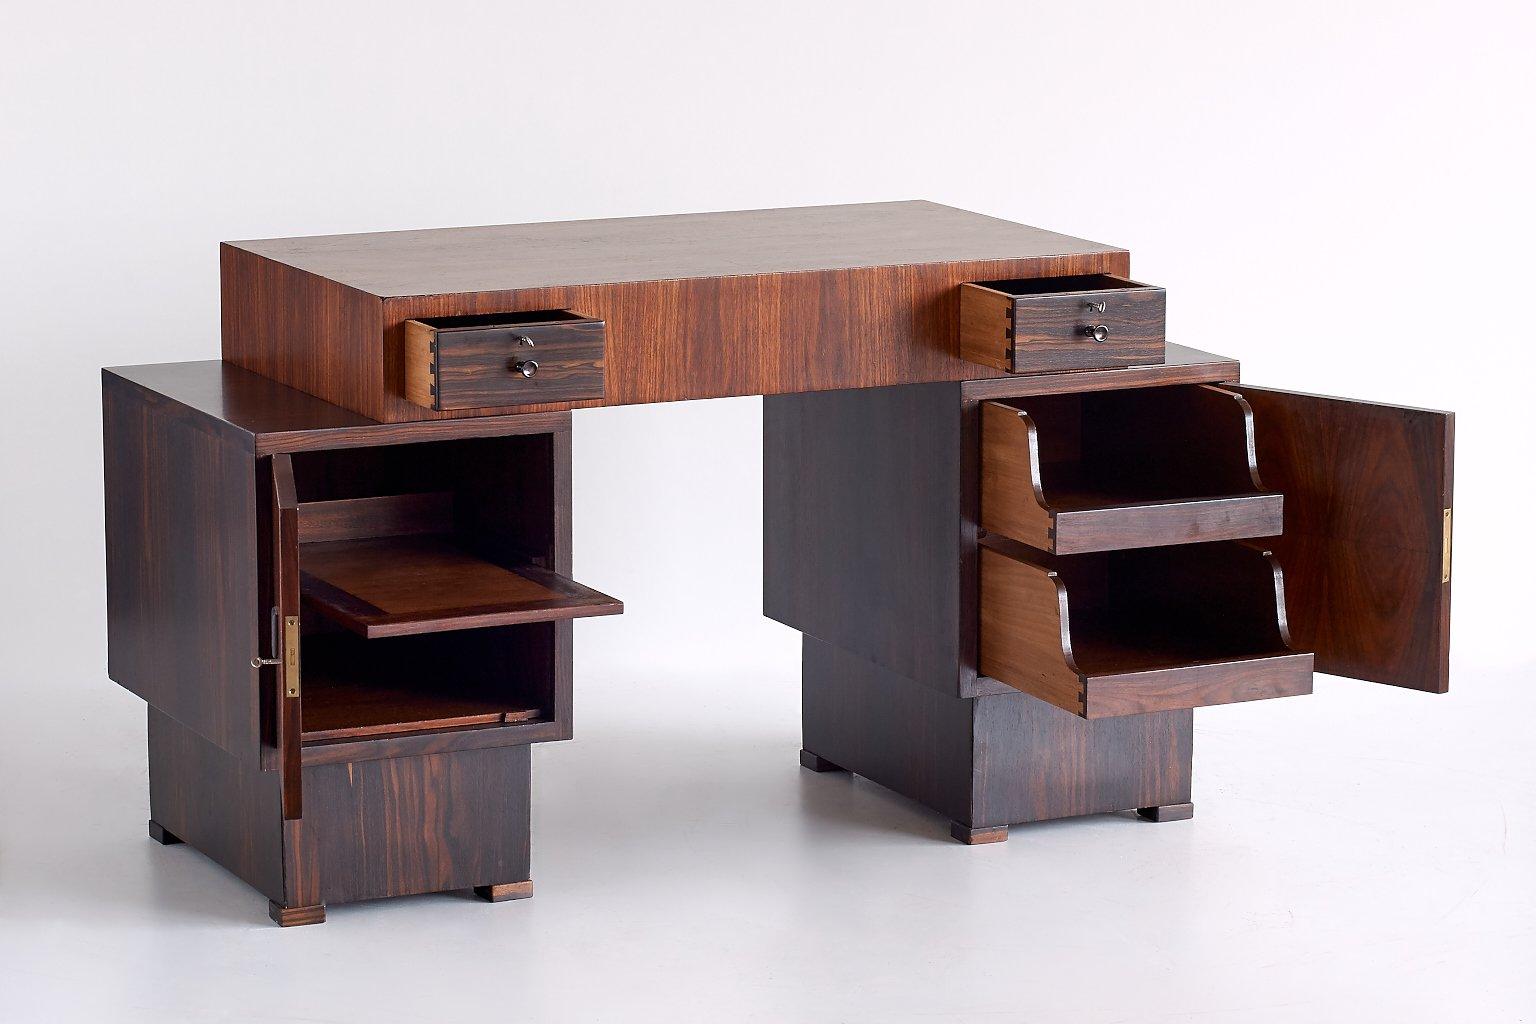 art deco schreibtisch aus palisander makasser ebenholz. Black Bedroom Furniture Sets. Home Design Ideas